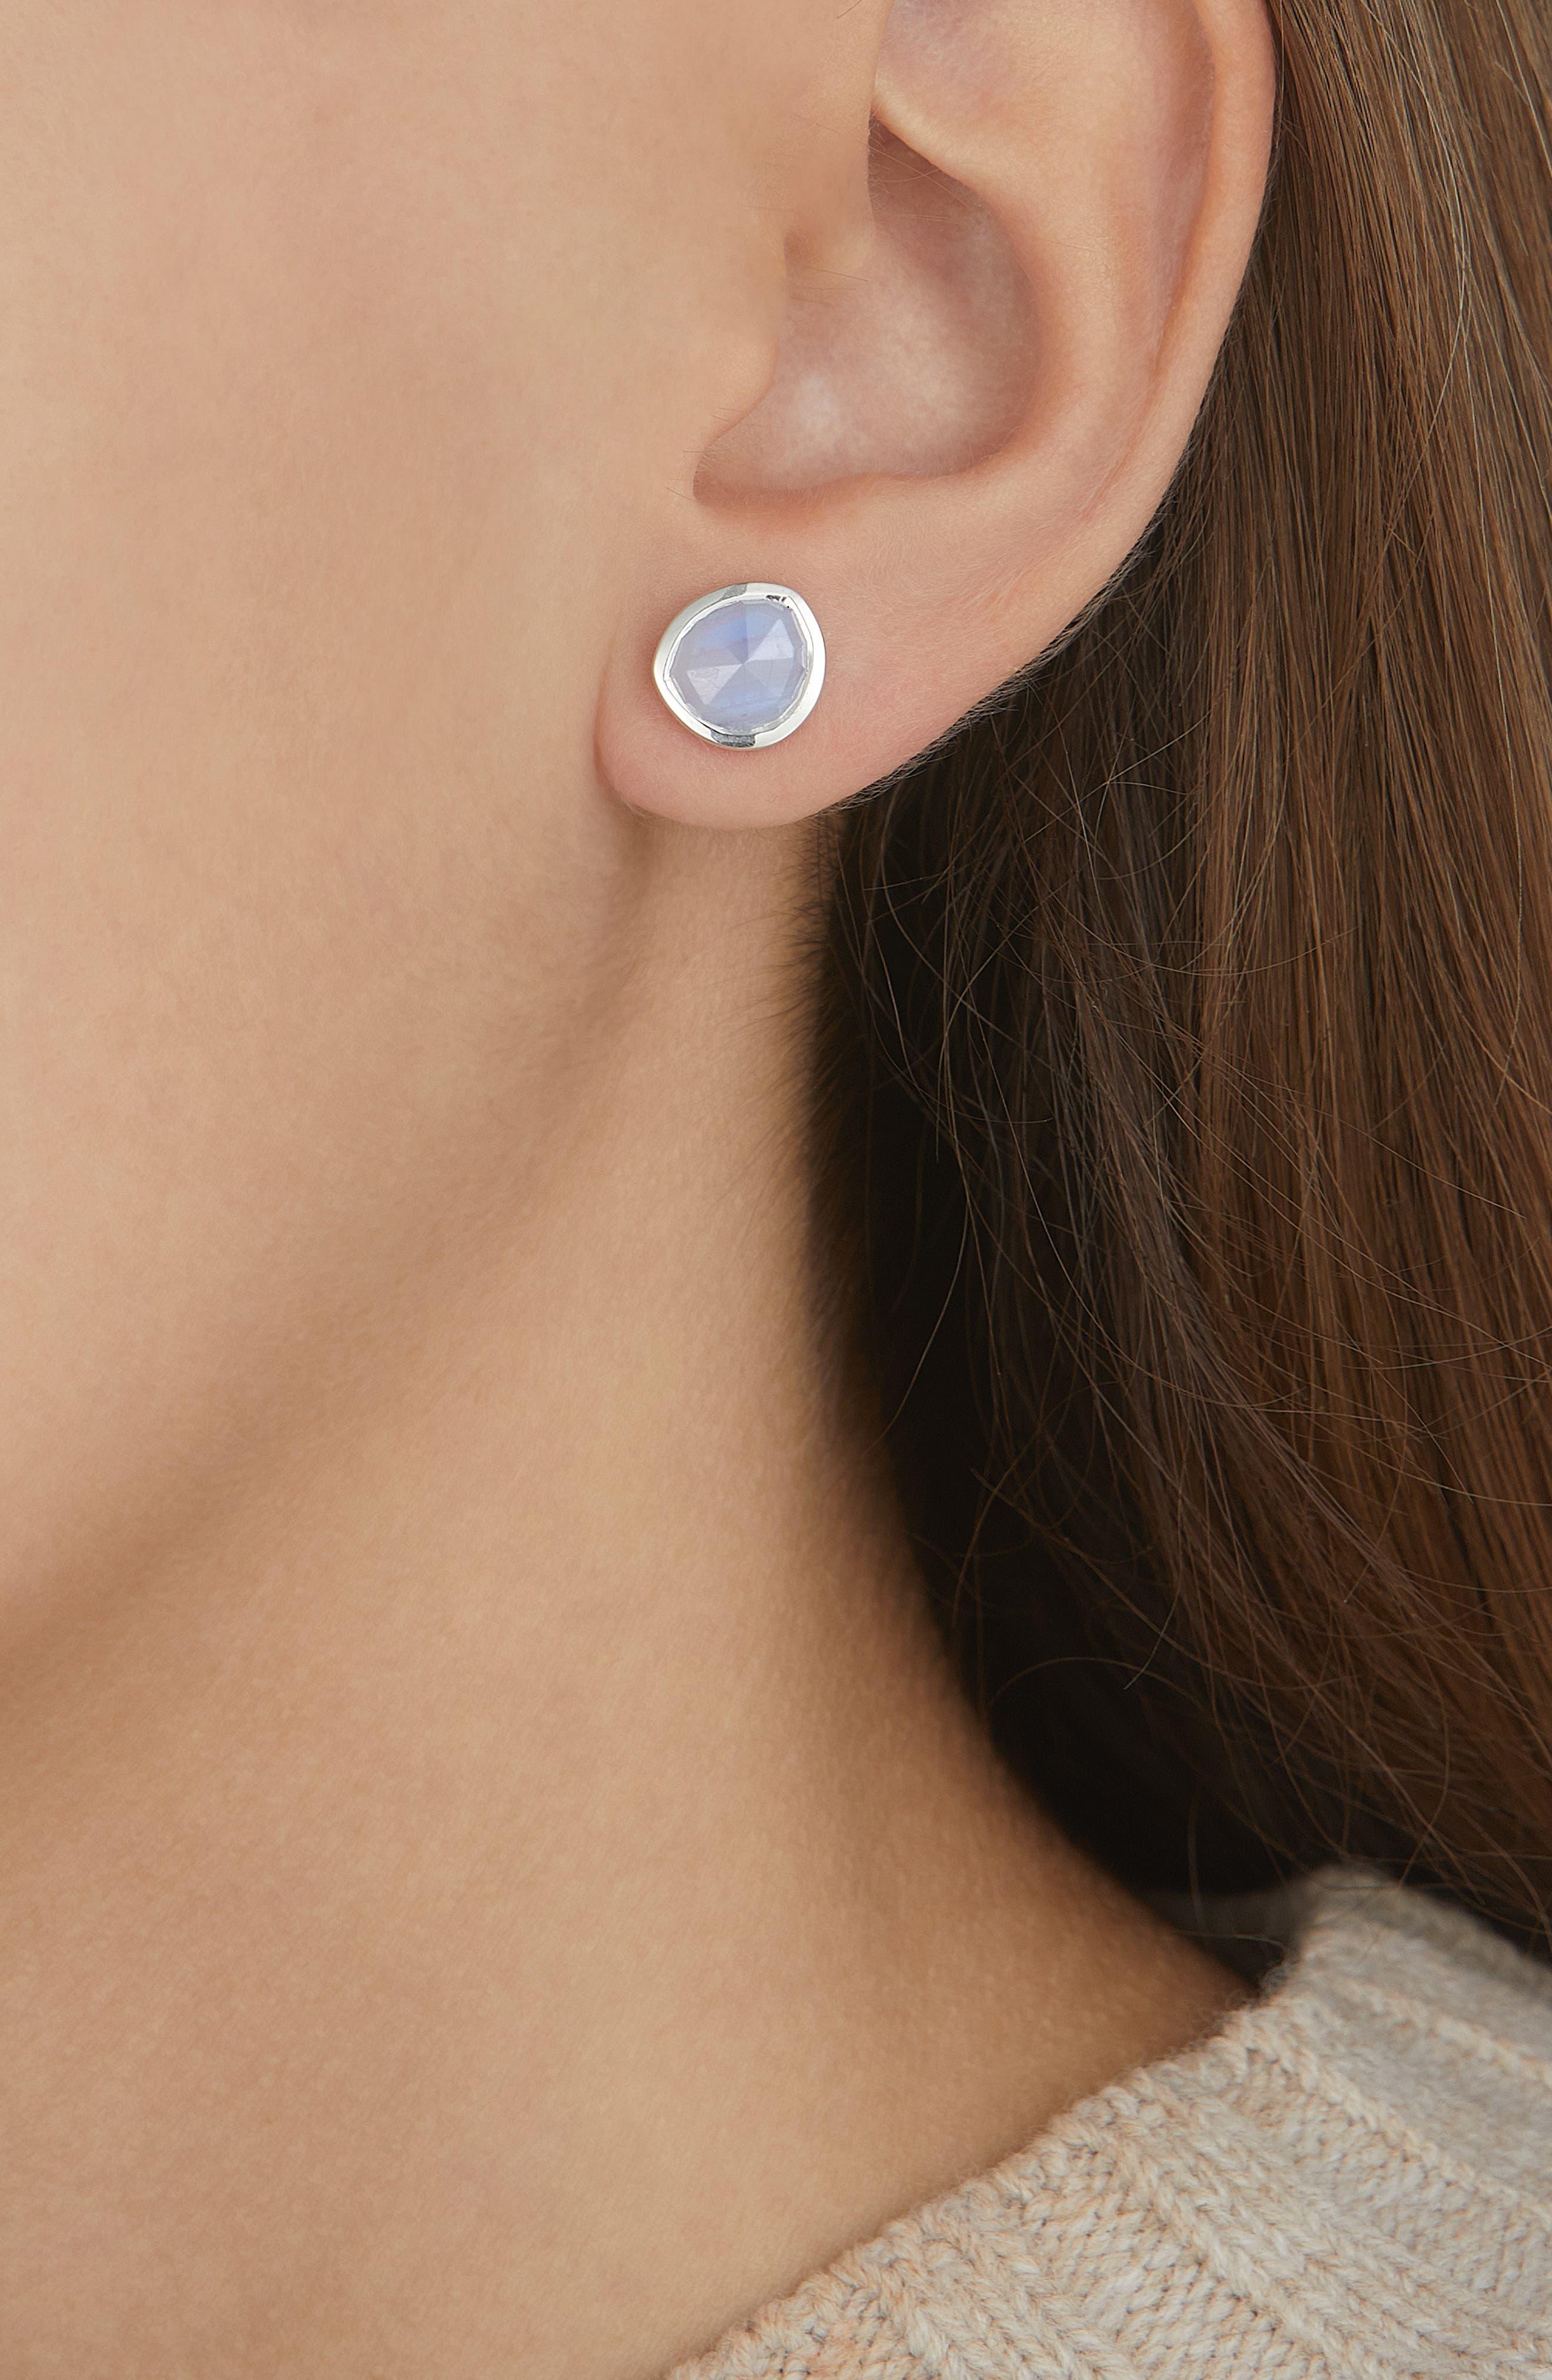 Siren Stud Earrings,                             Alternate thumbnail 2, color,                             Silver/ Blue Lace Agate